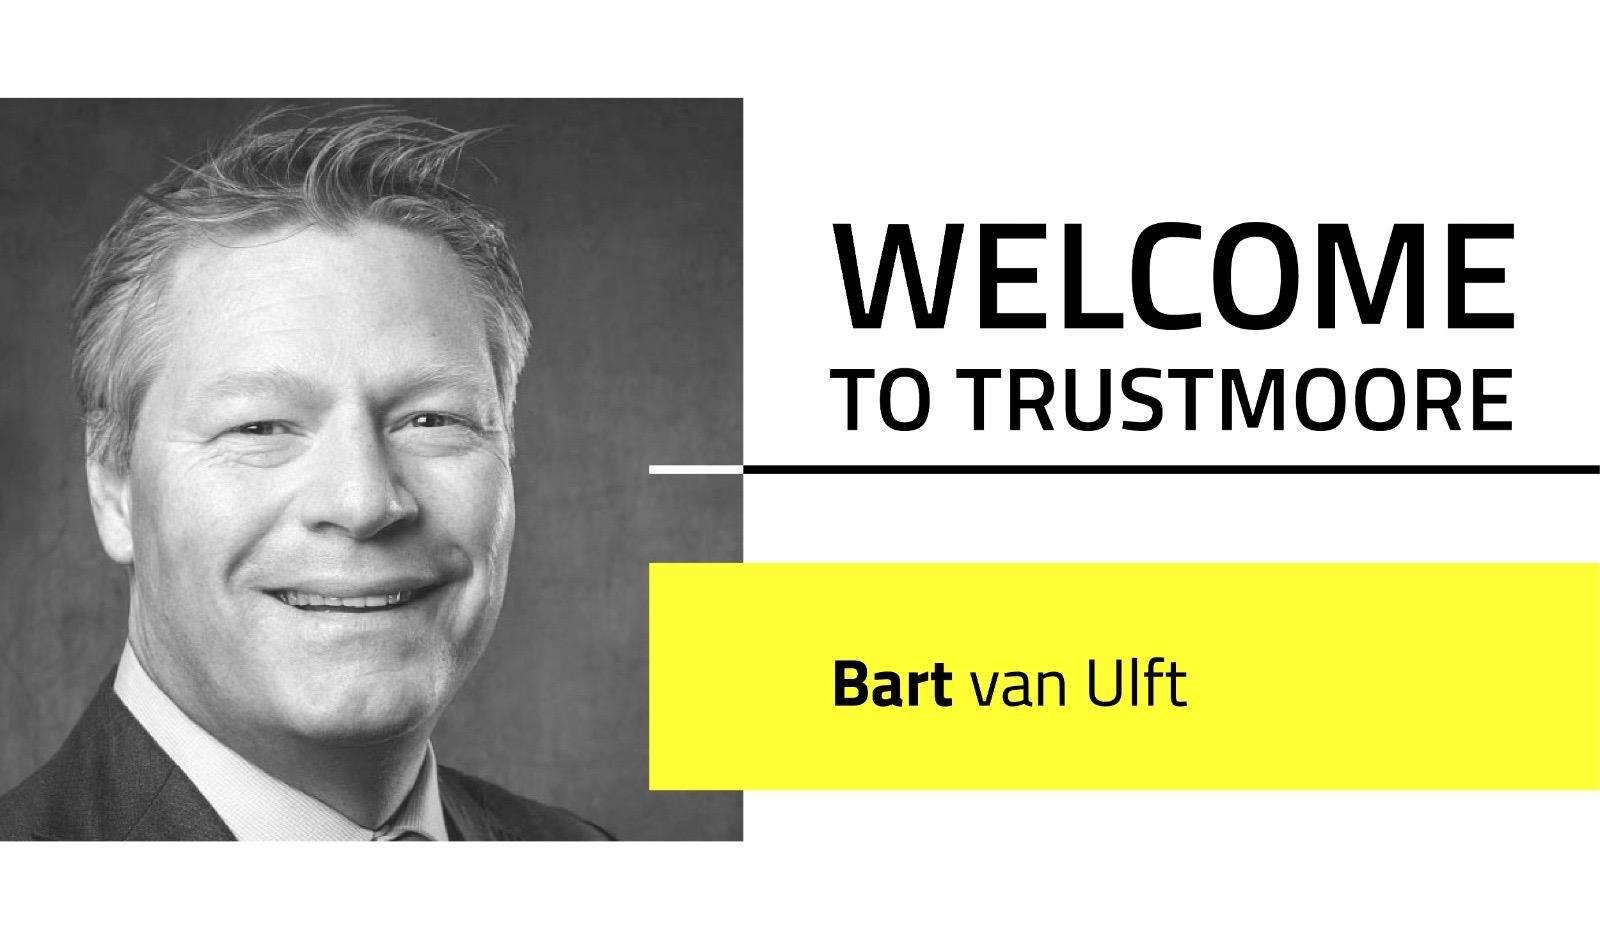 Welcome - Bart van Ulft